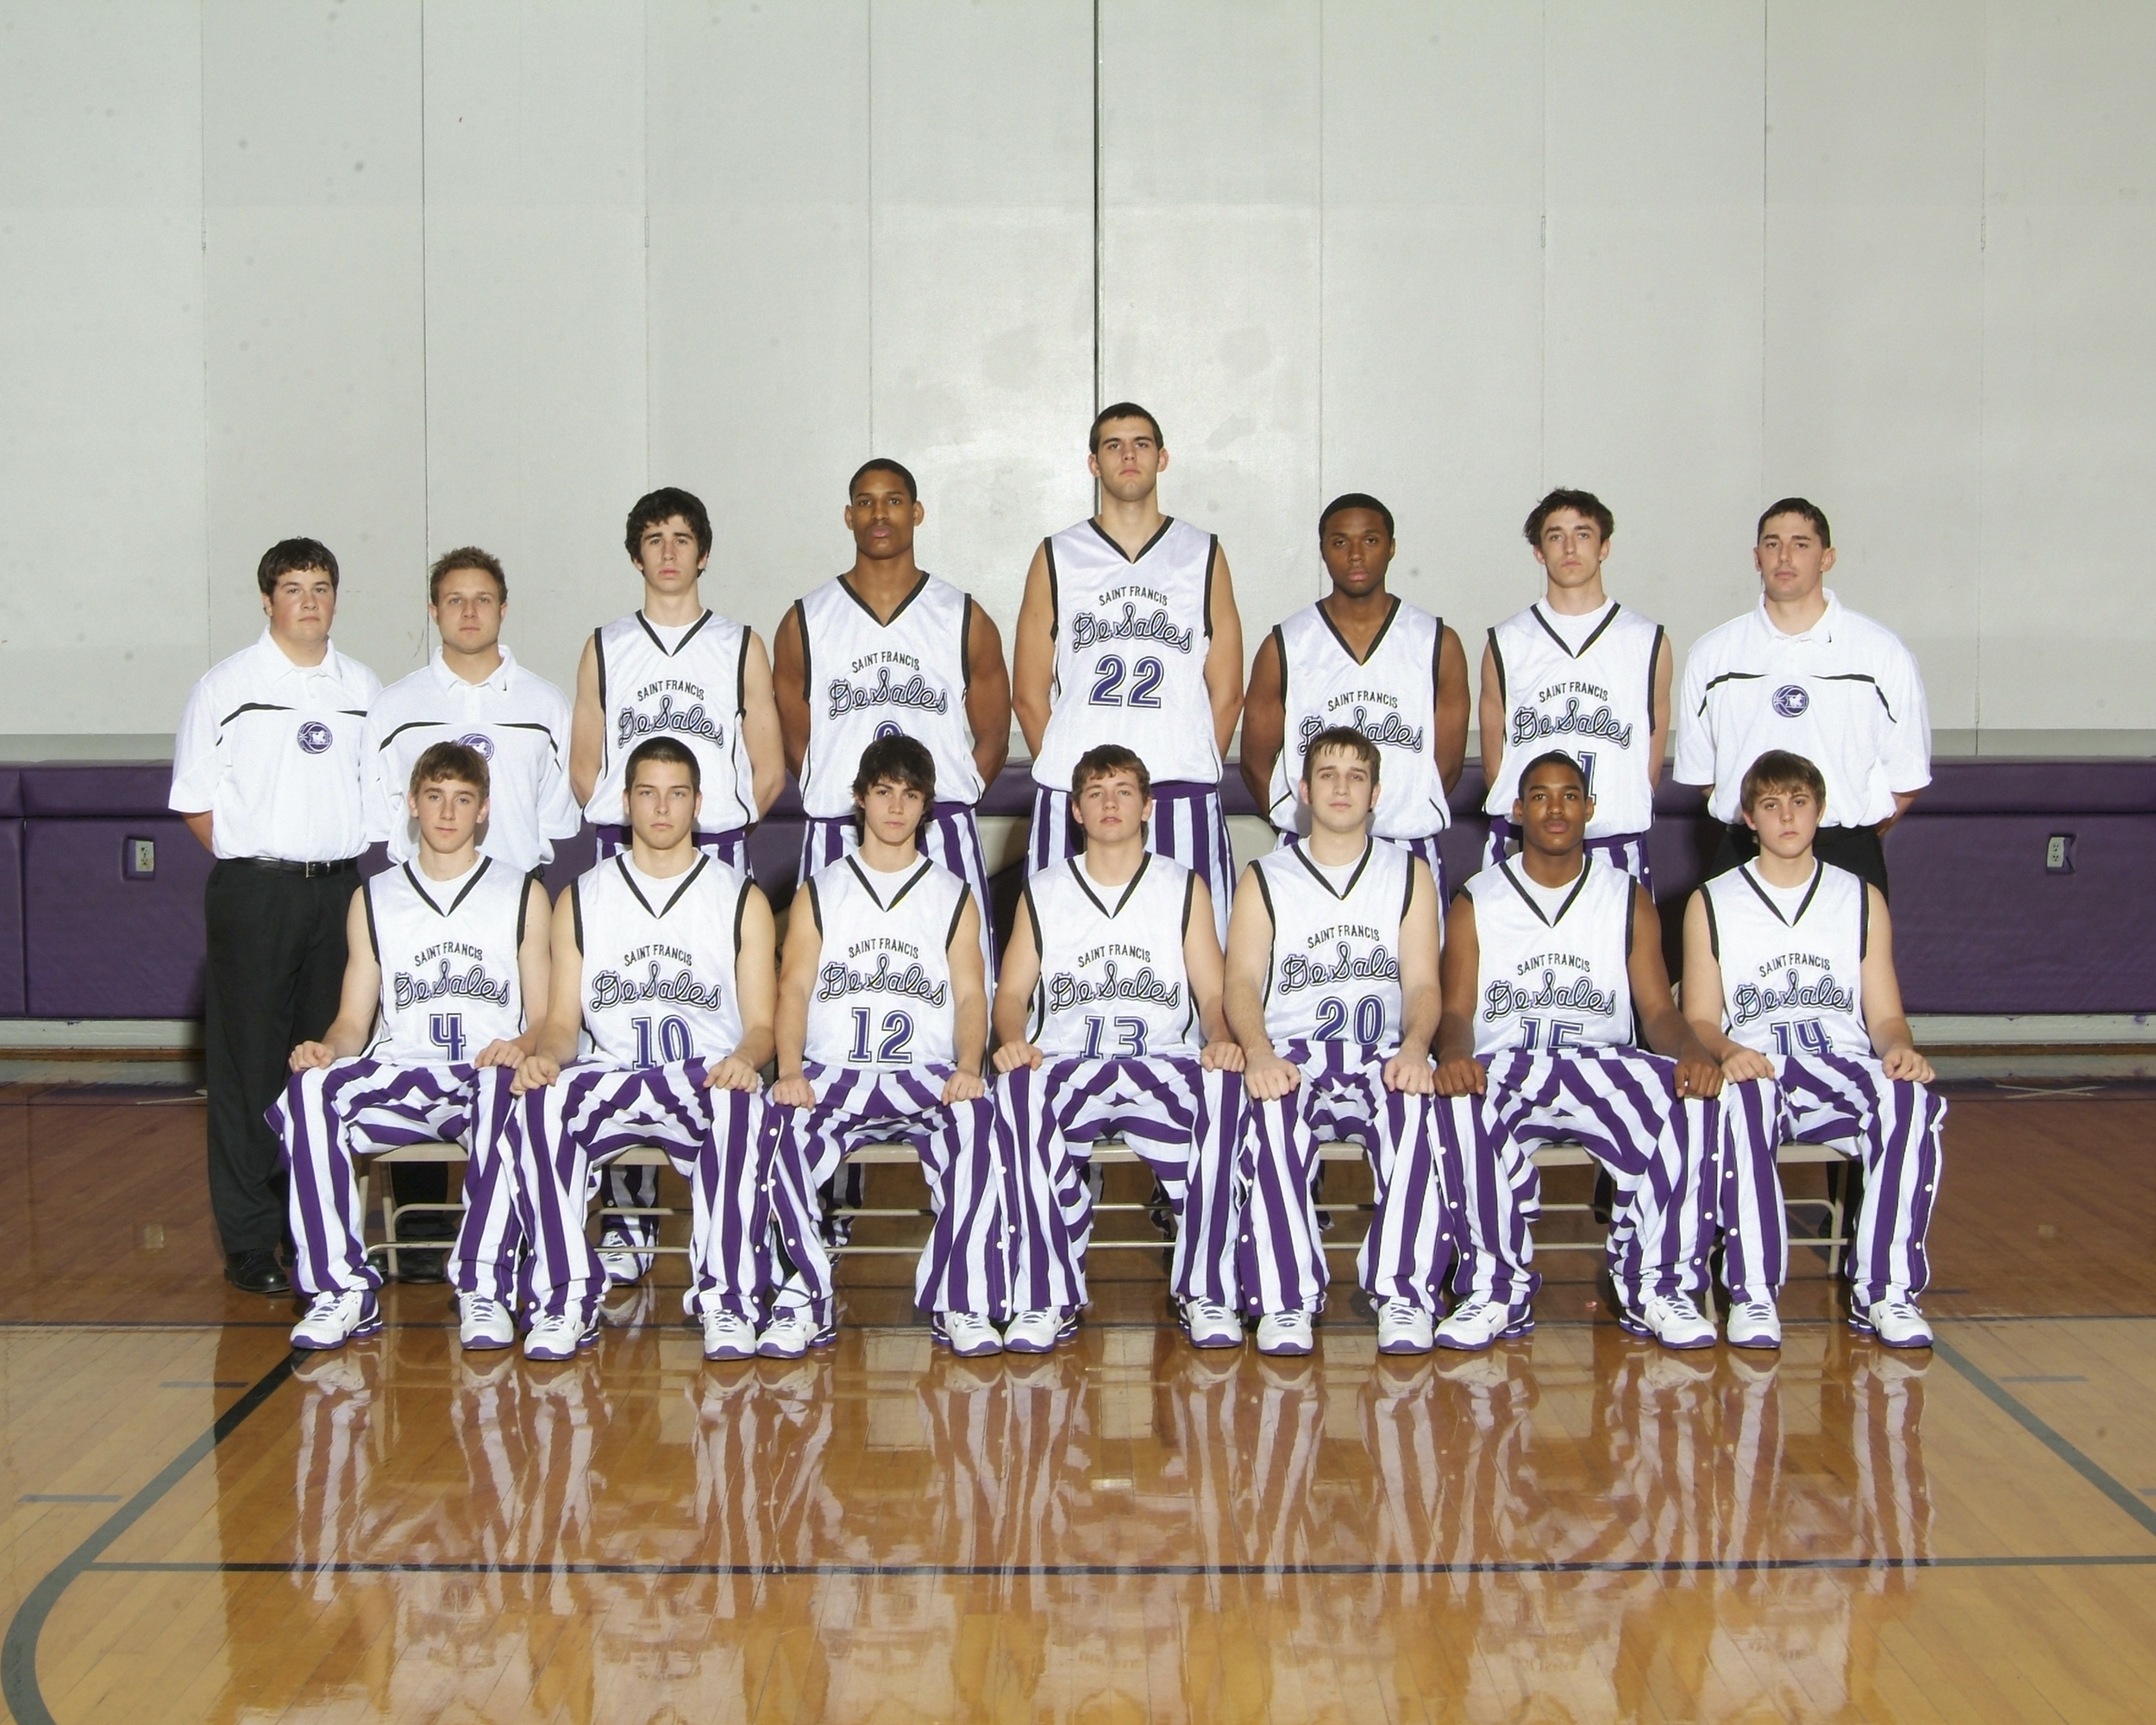 2007 Regional Champions